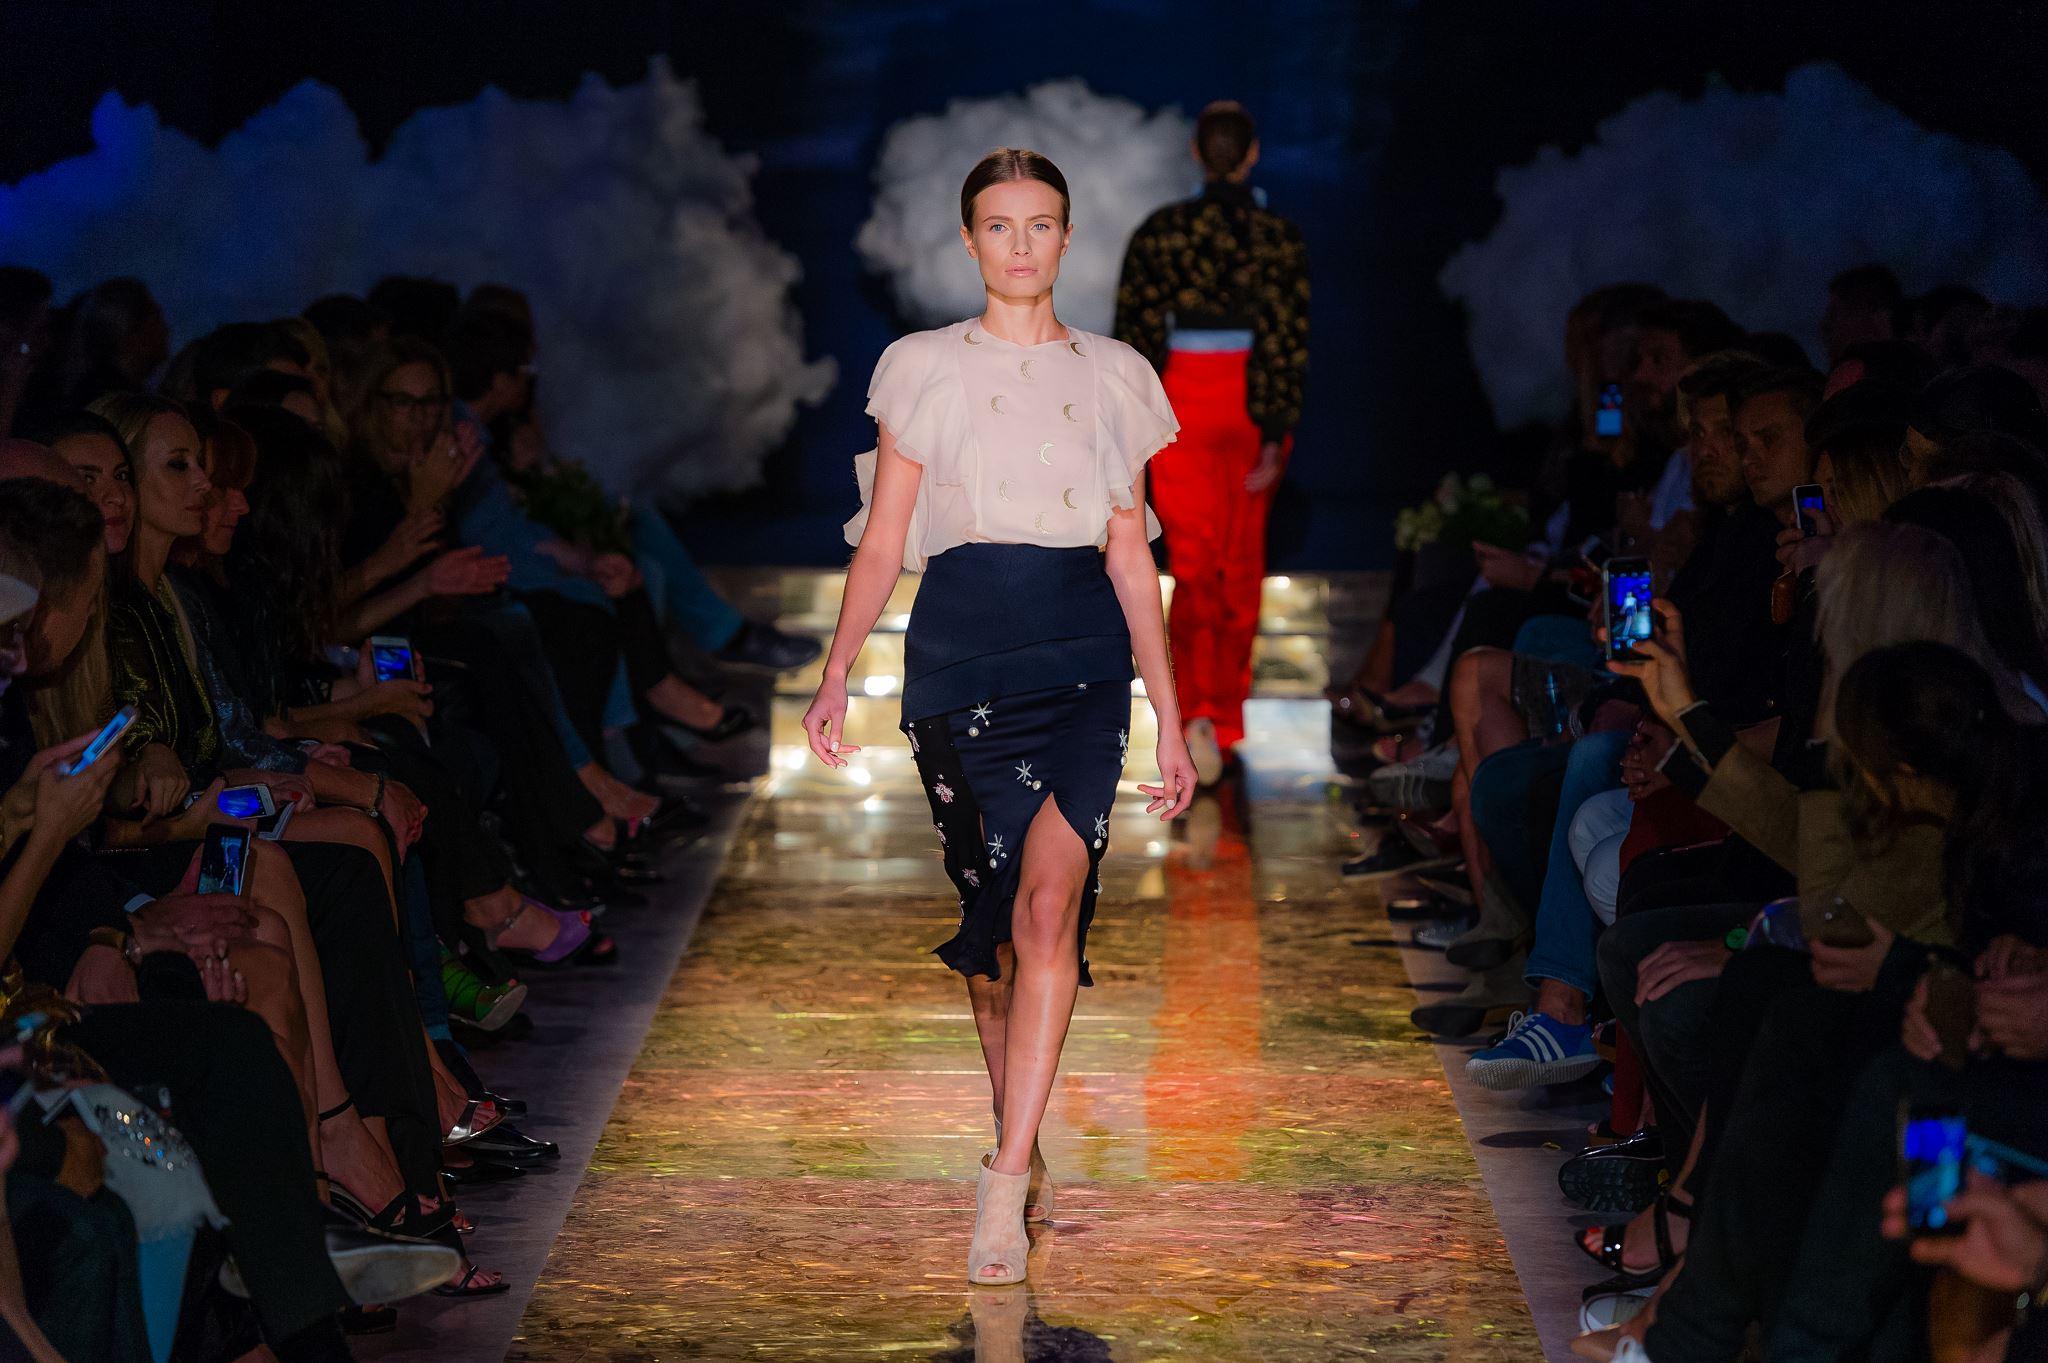 92_maciejzien_190916_web_fot_andrzej_marchwinski_fashion_images